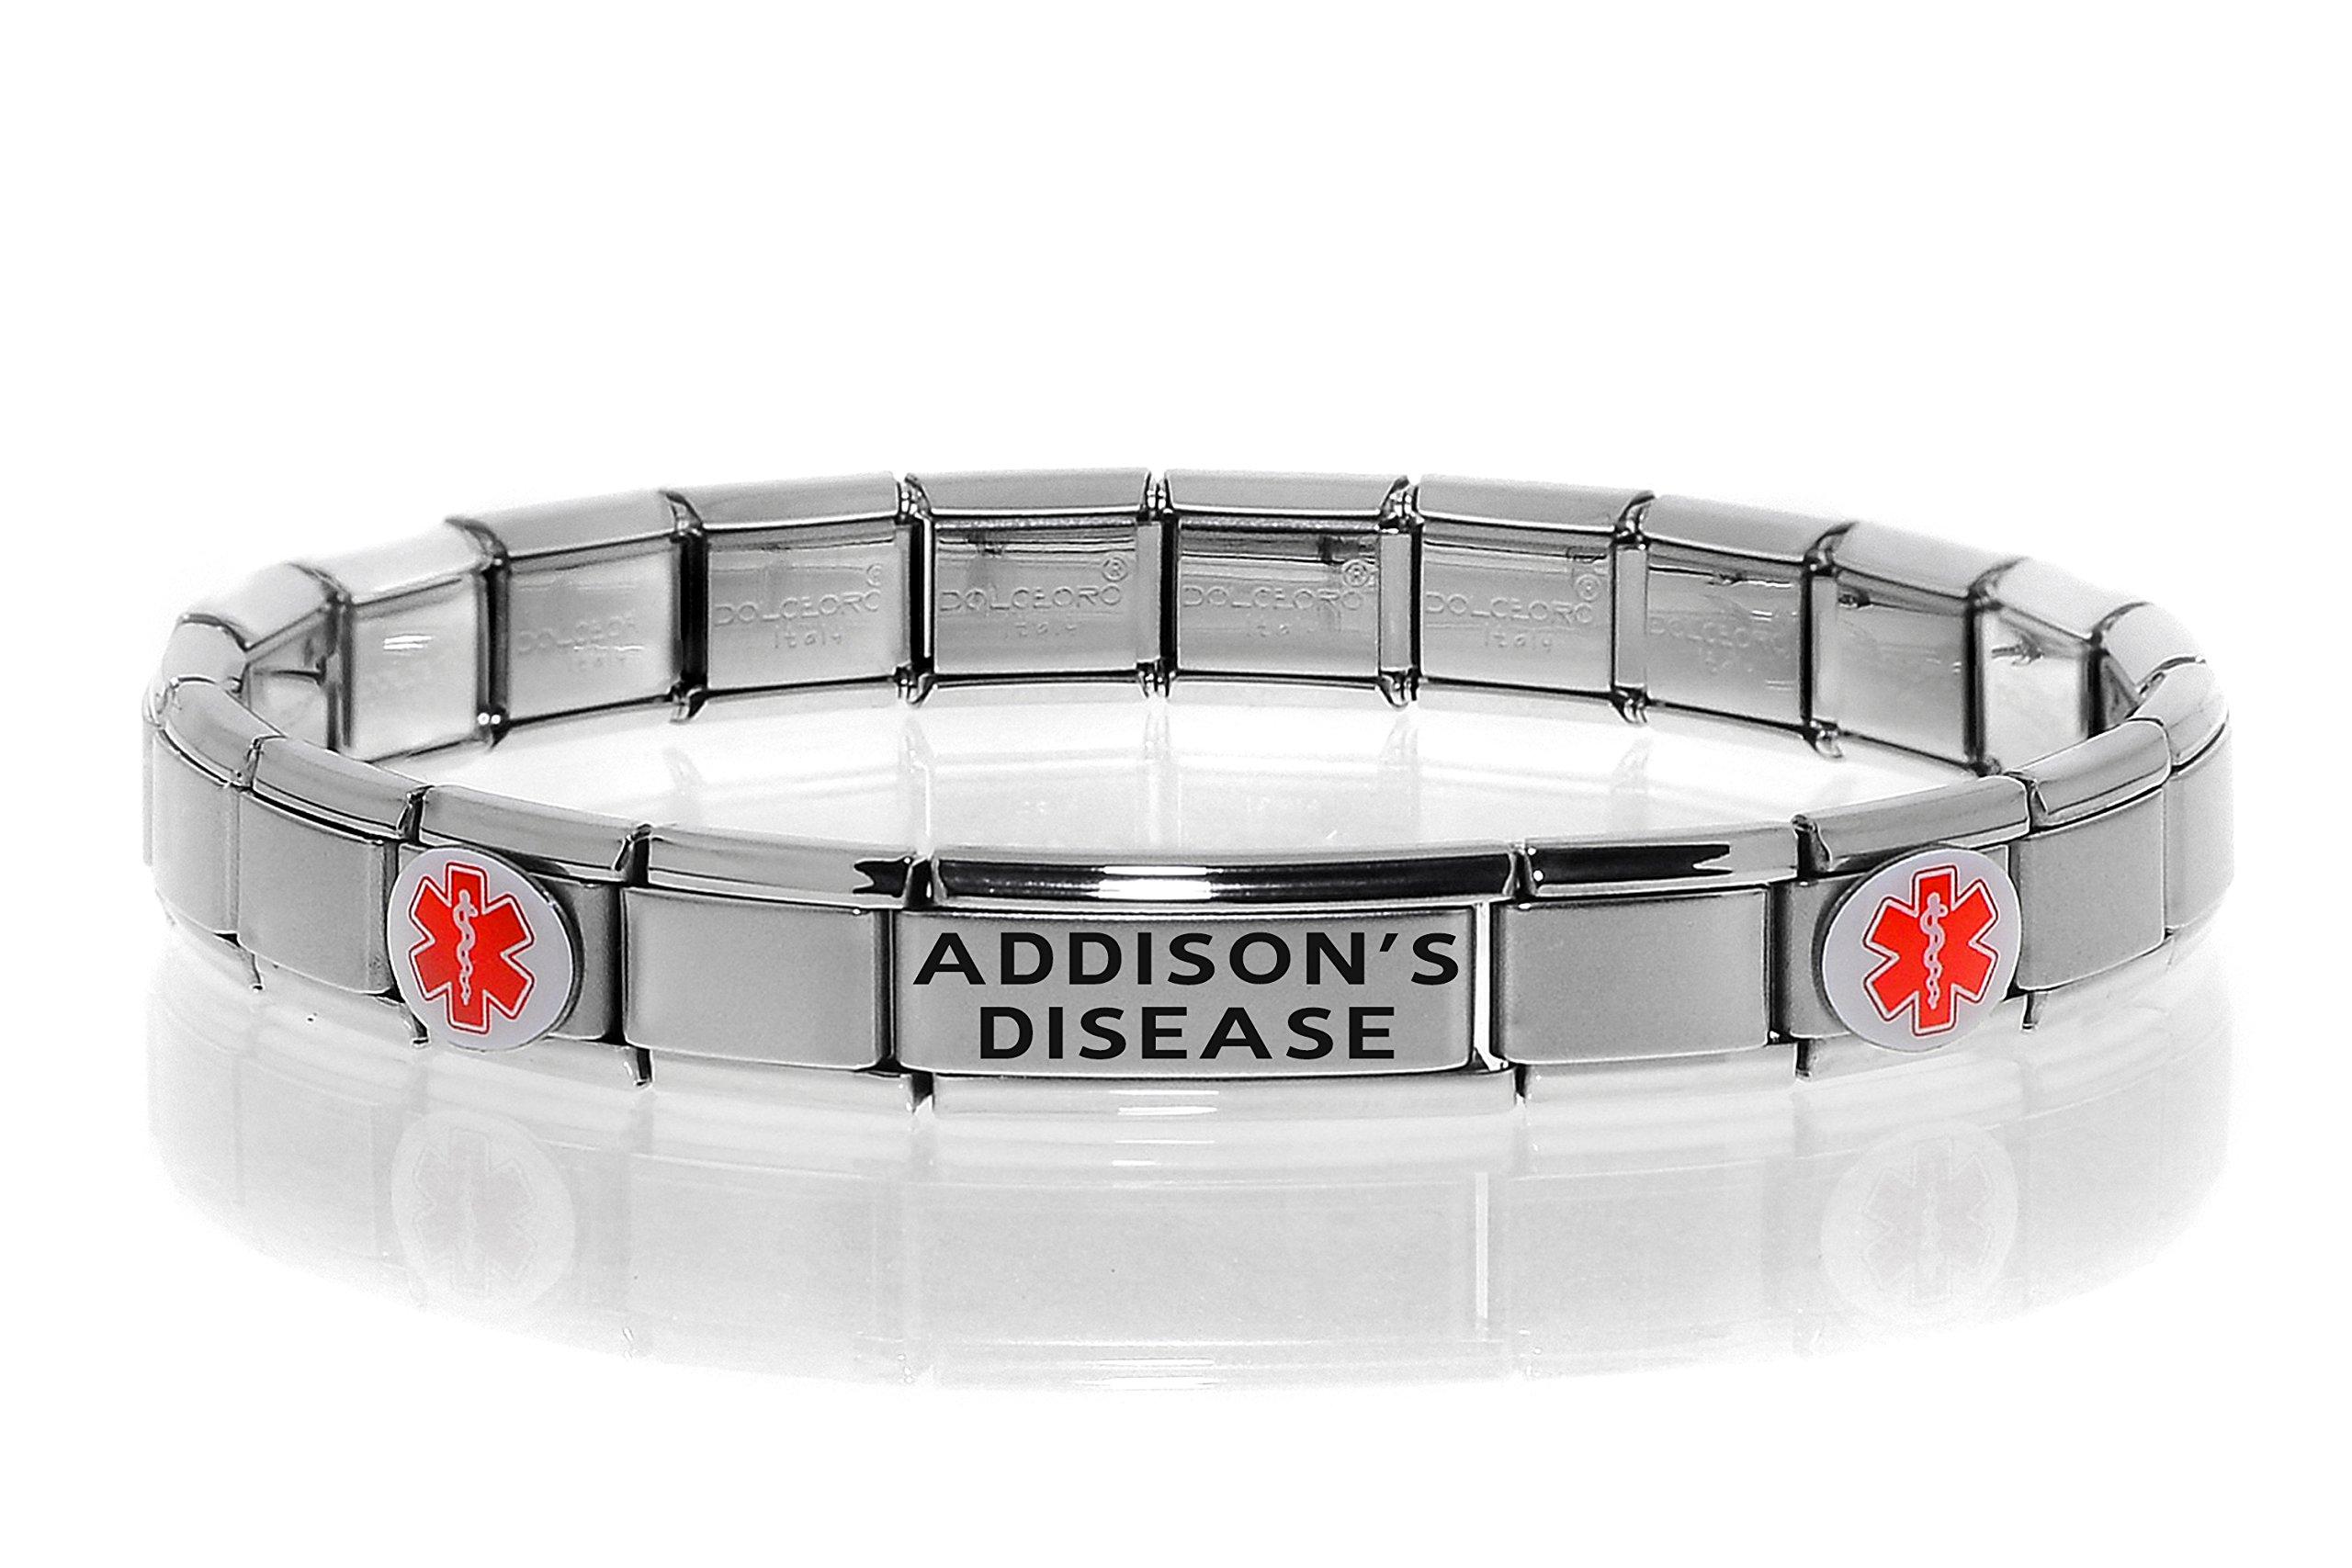 Dolceoro Addison's Disease Medical Alert Bracelet - Stainless Steel Stretchable Italian Style Modular Charm Links